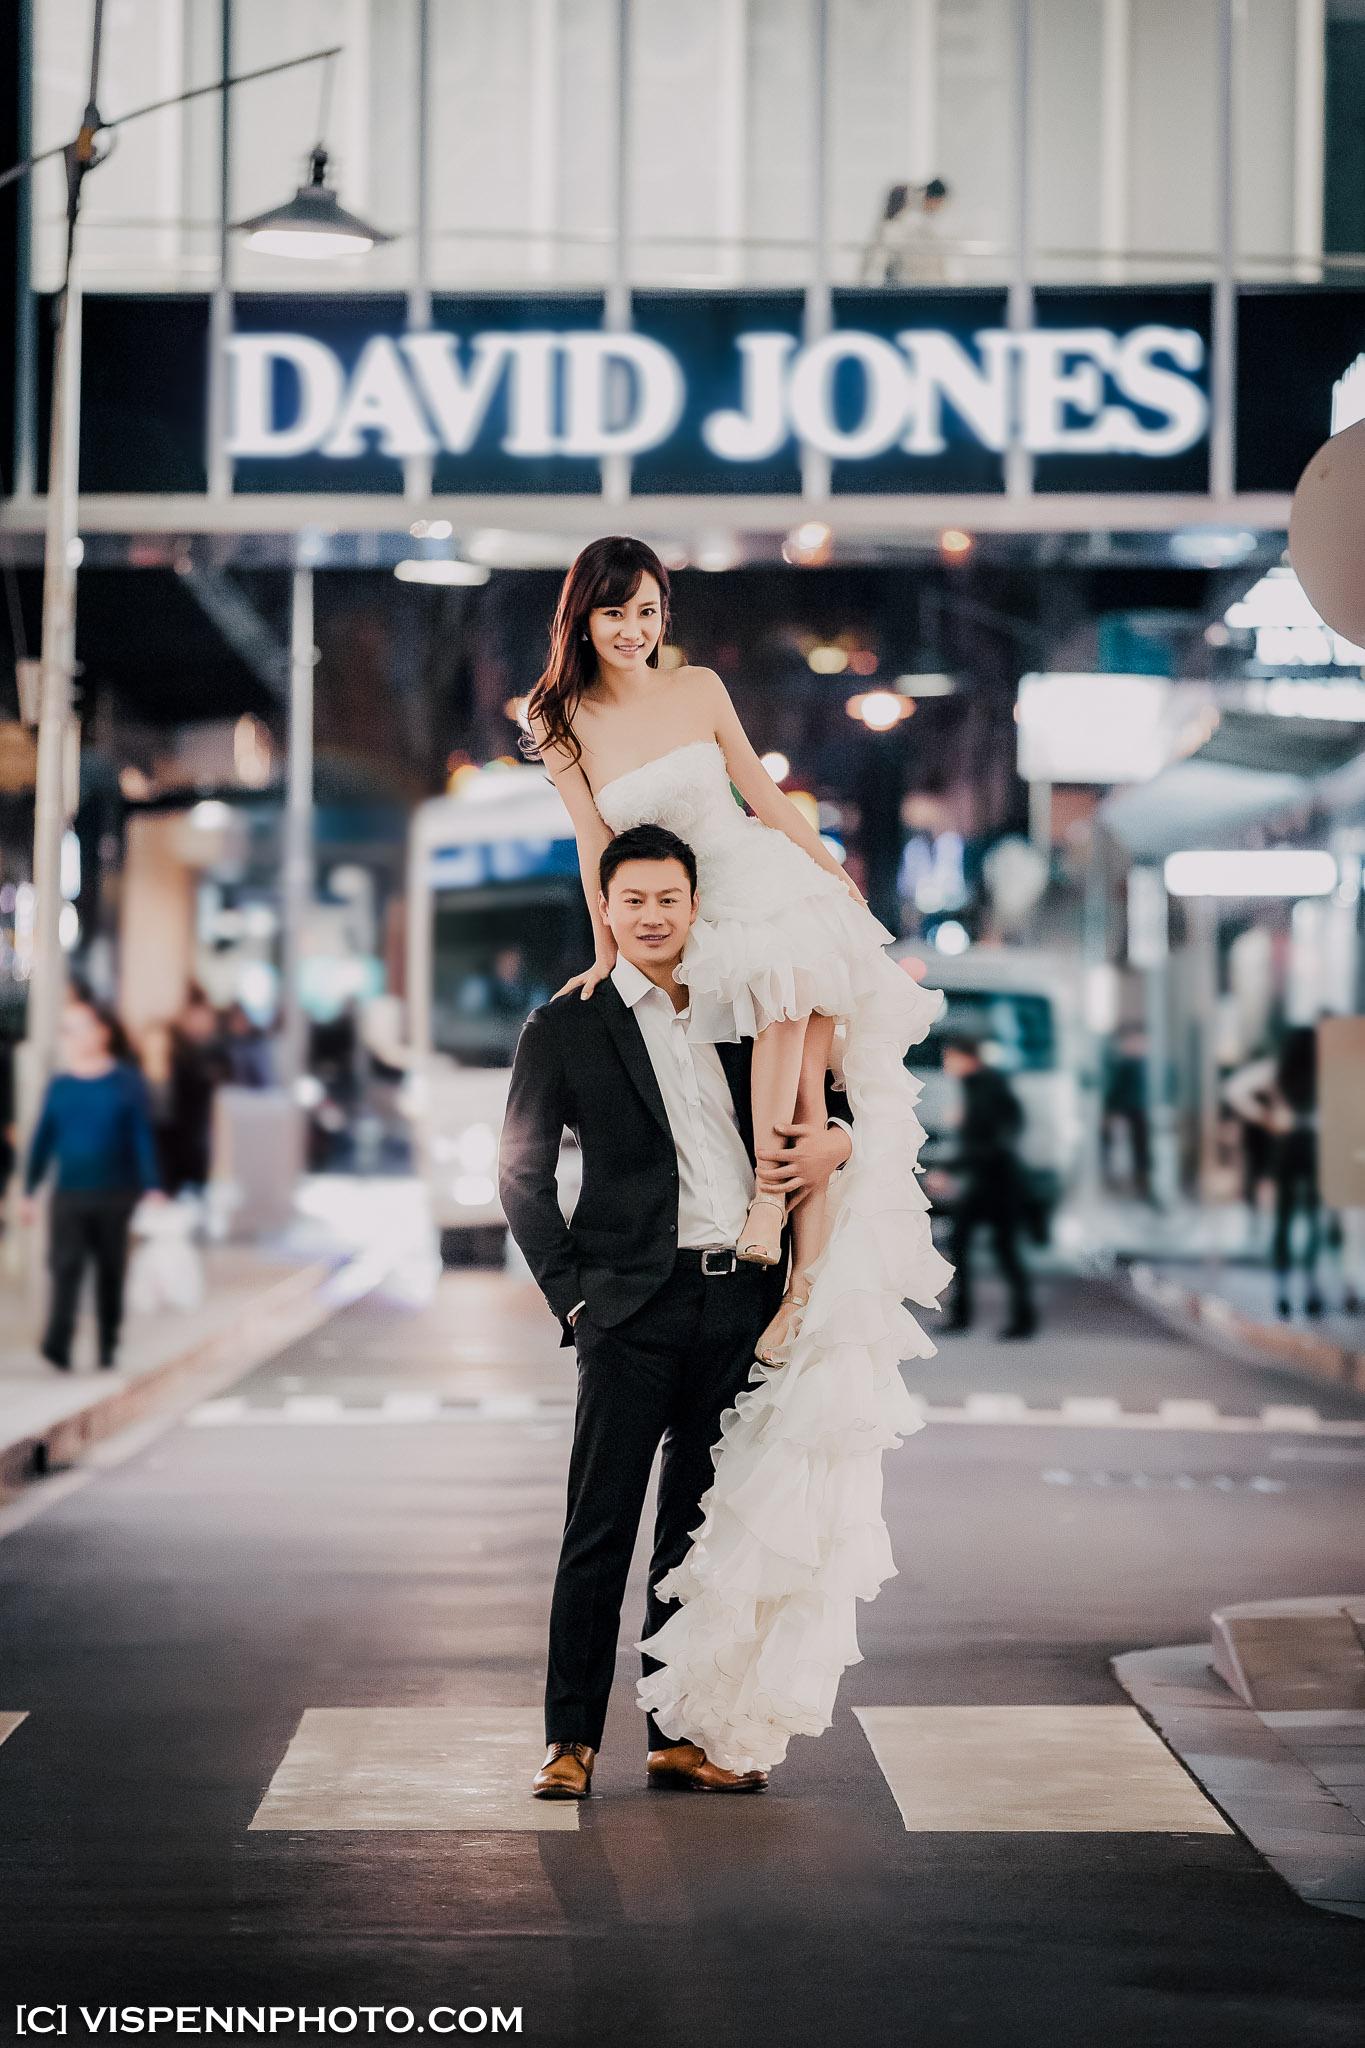 PRE WEDDING Photography Melbourne VISPENN 墨尔本 婚纱照 结婚照 婚纱摄影 VISPENN ThomasWangPreWedding 3448